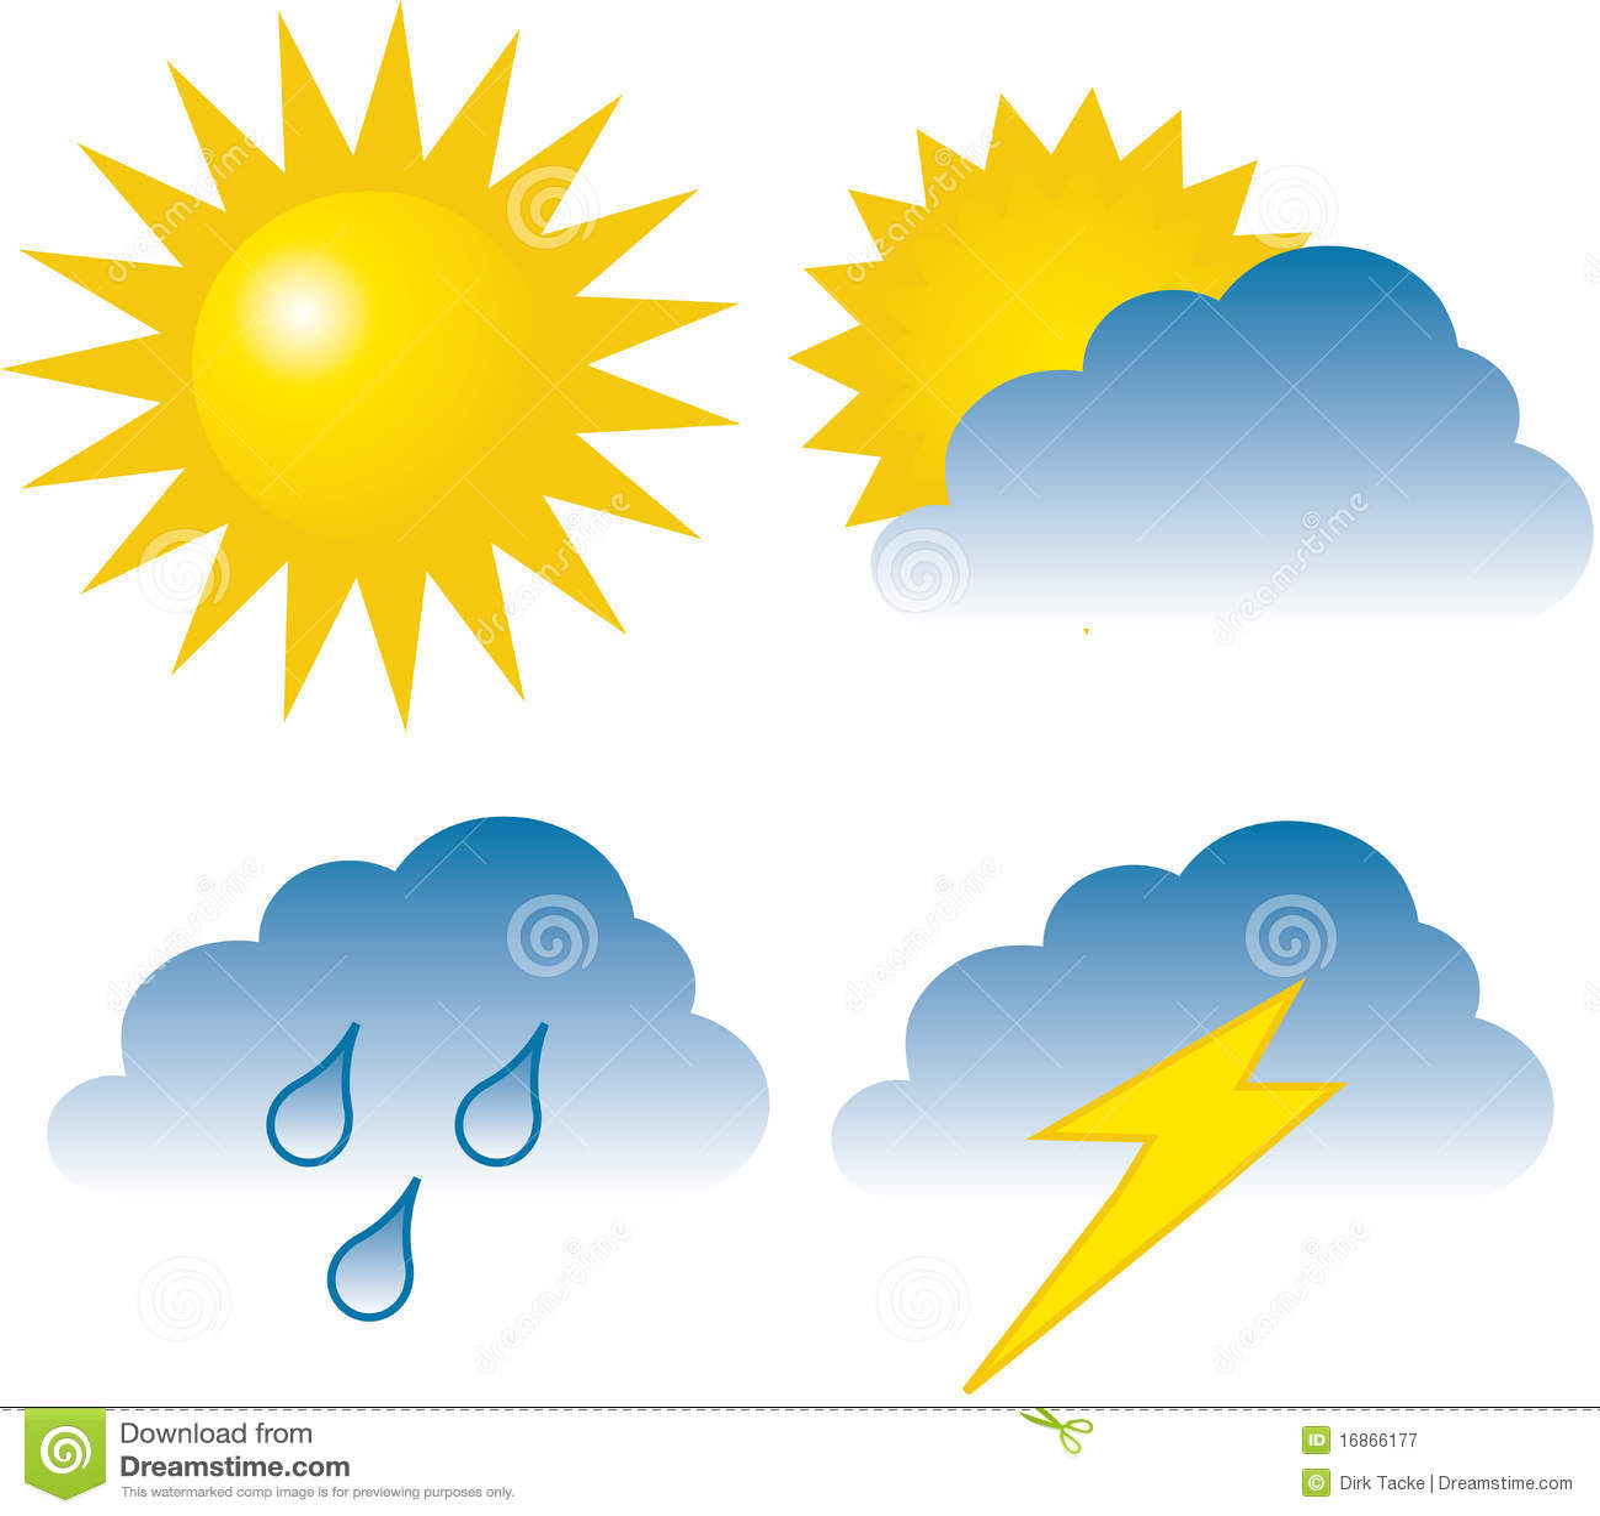 hight resolution of 4 weather icons sunny overcast rain lightning